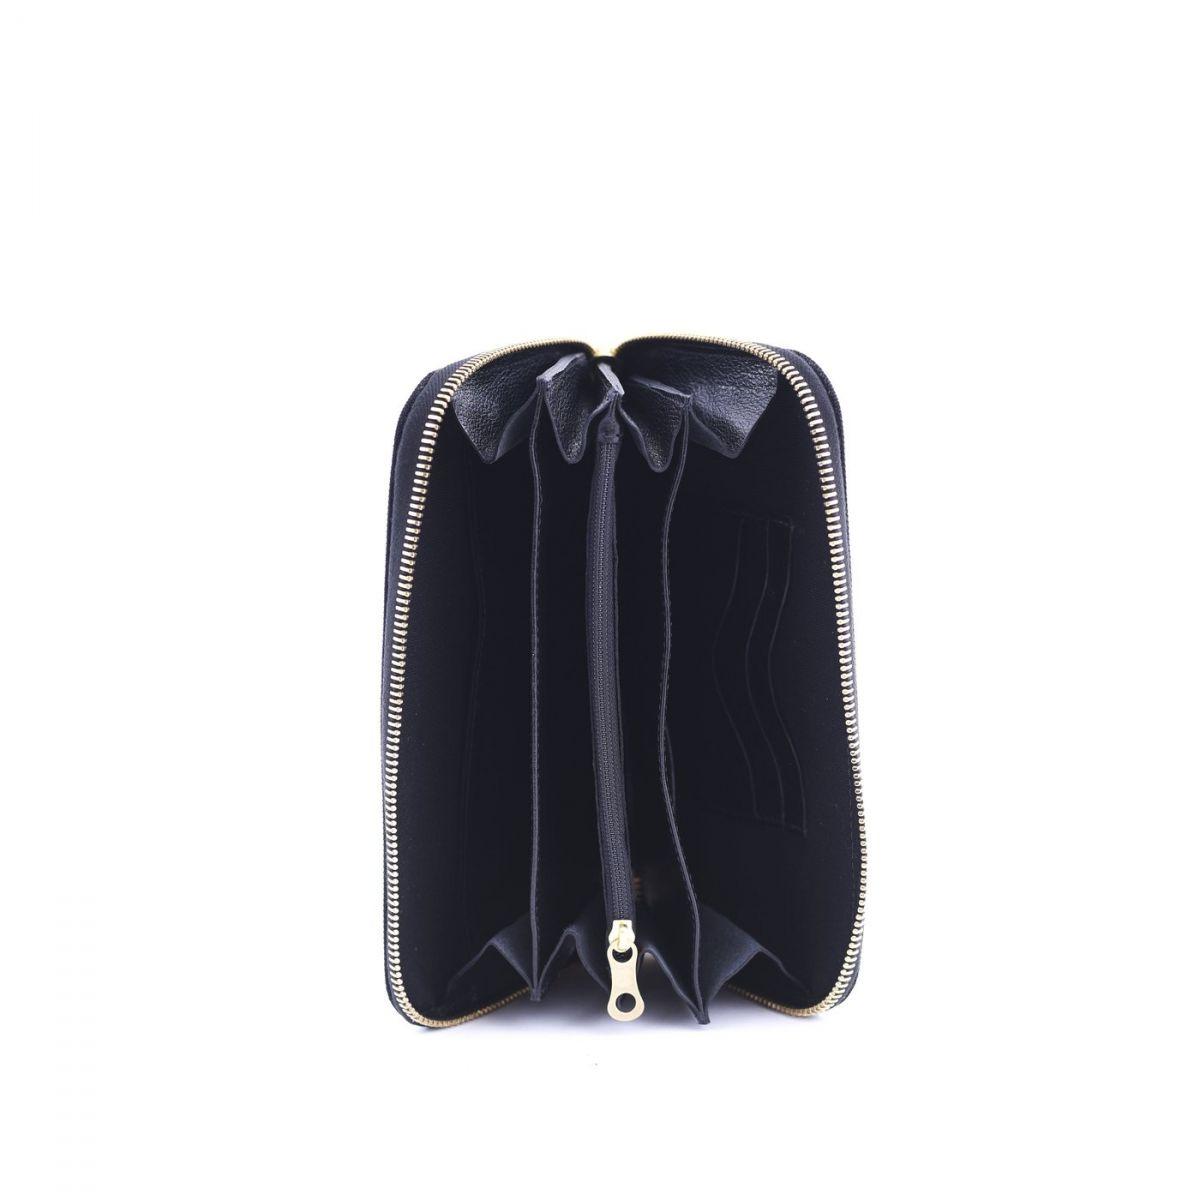 Wallet  in Nylon SMW086 color Black | Details